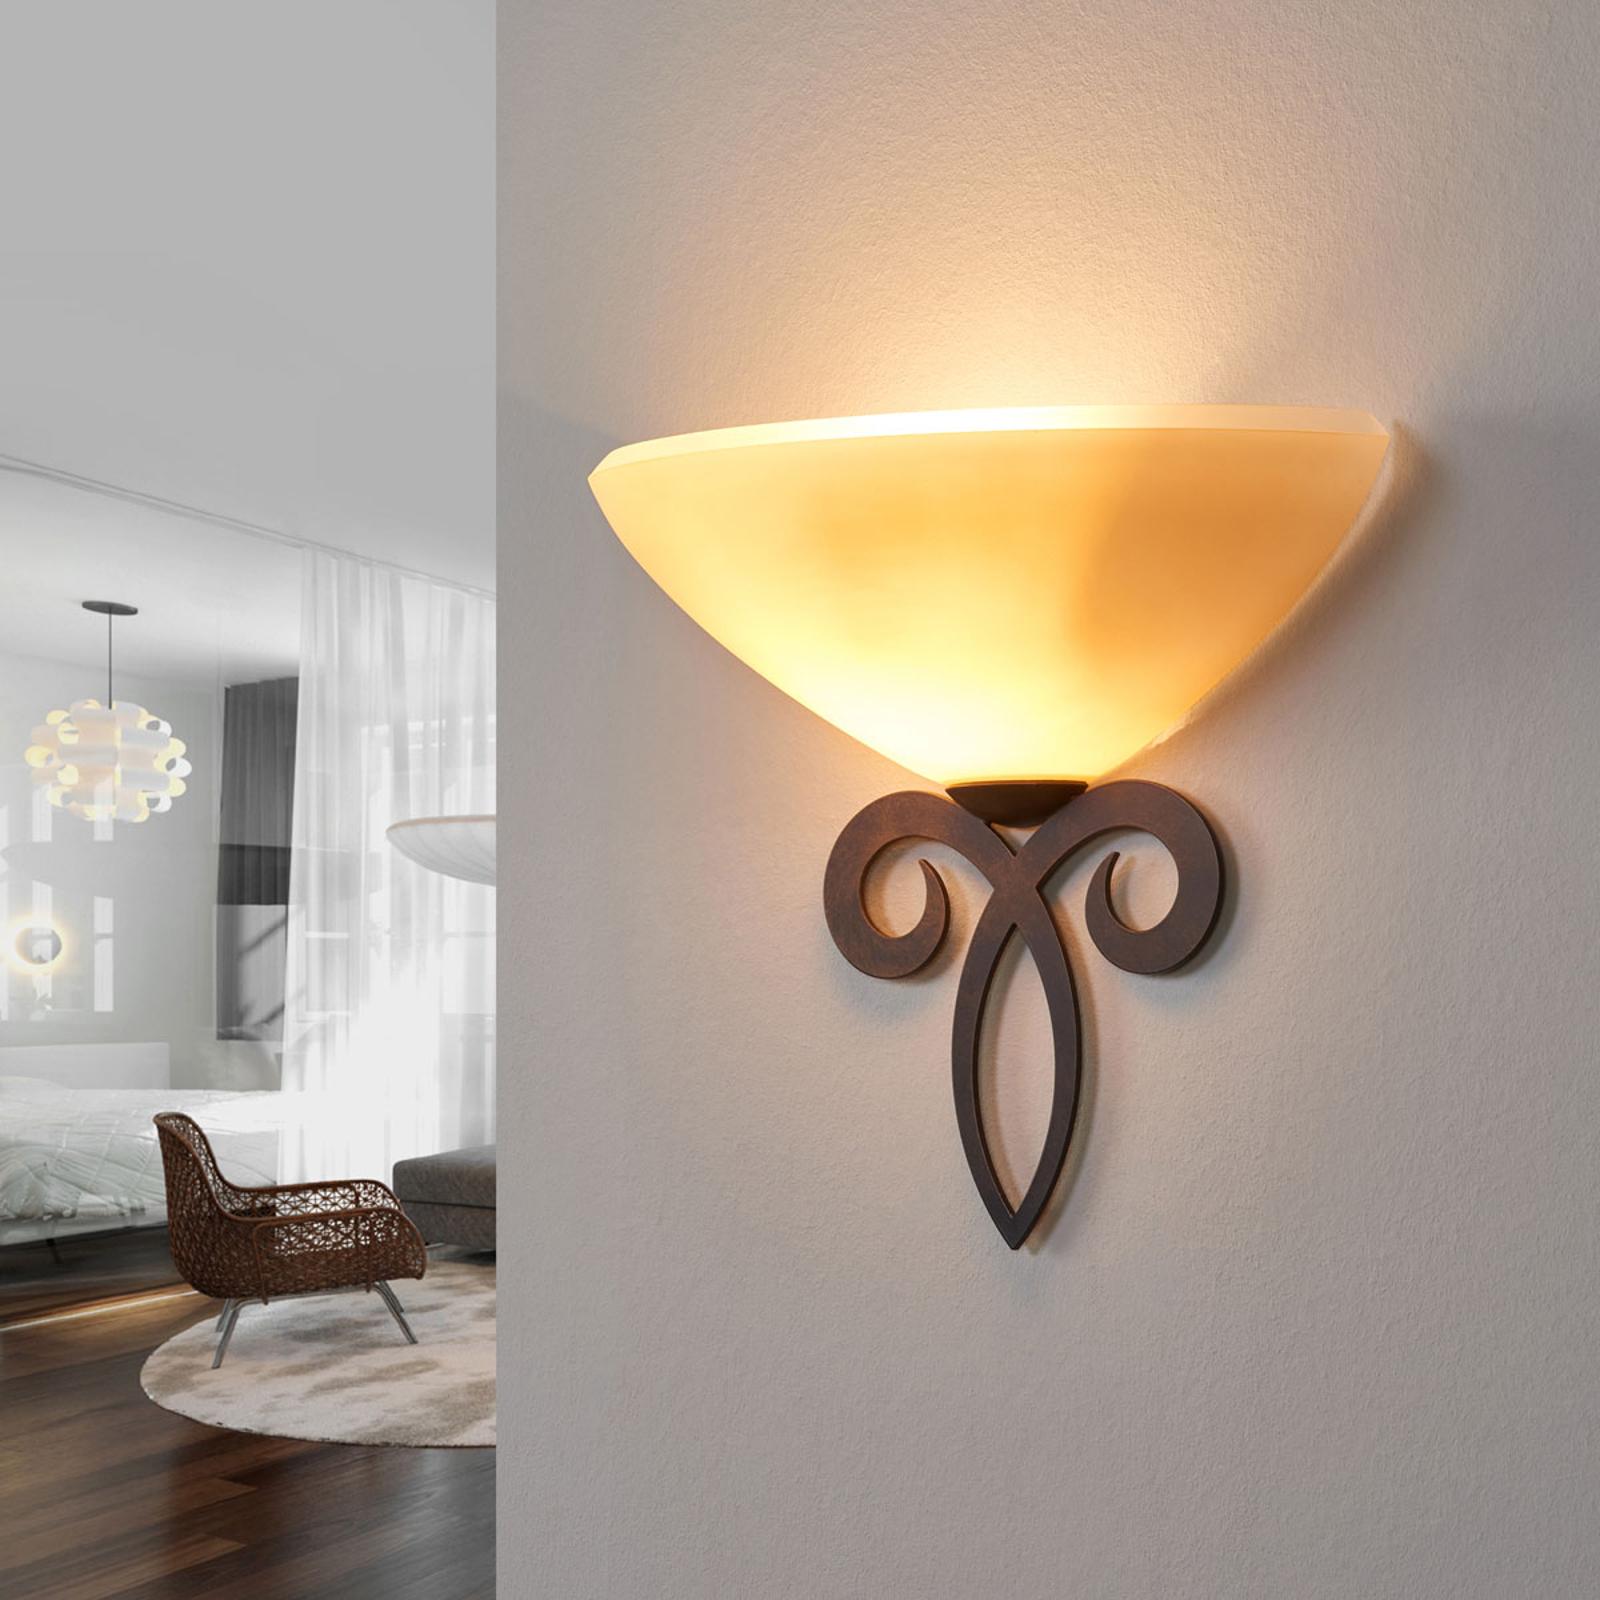 Glazen wandlamp Luca in landhuisstijl